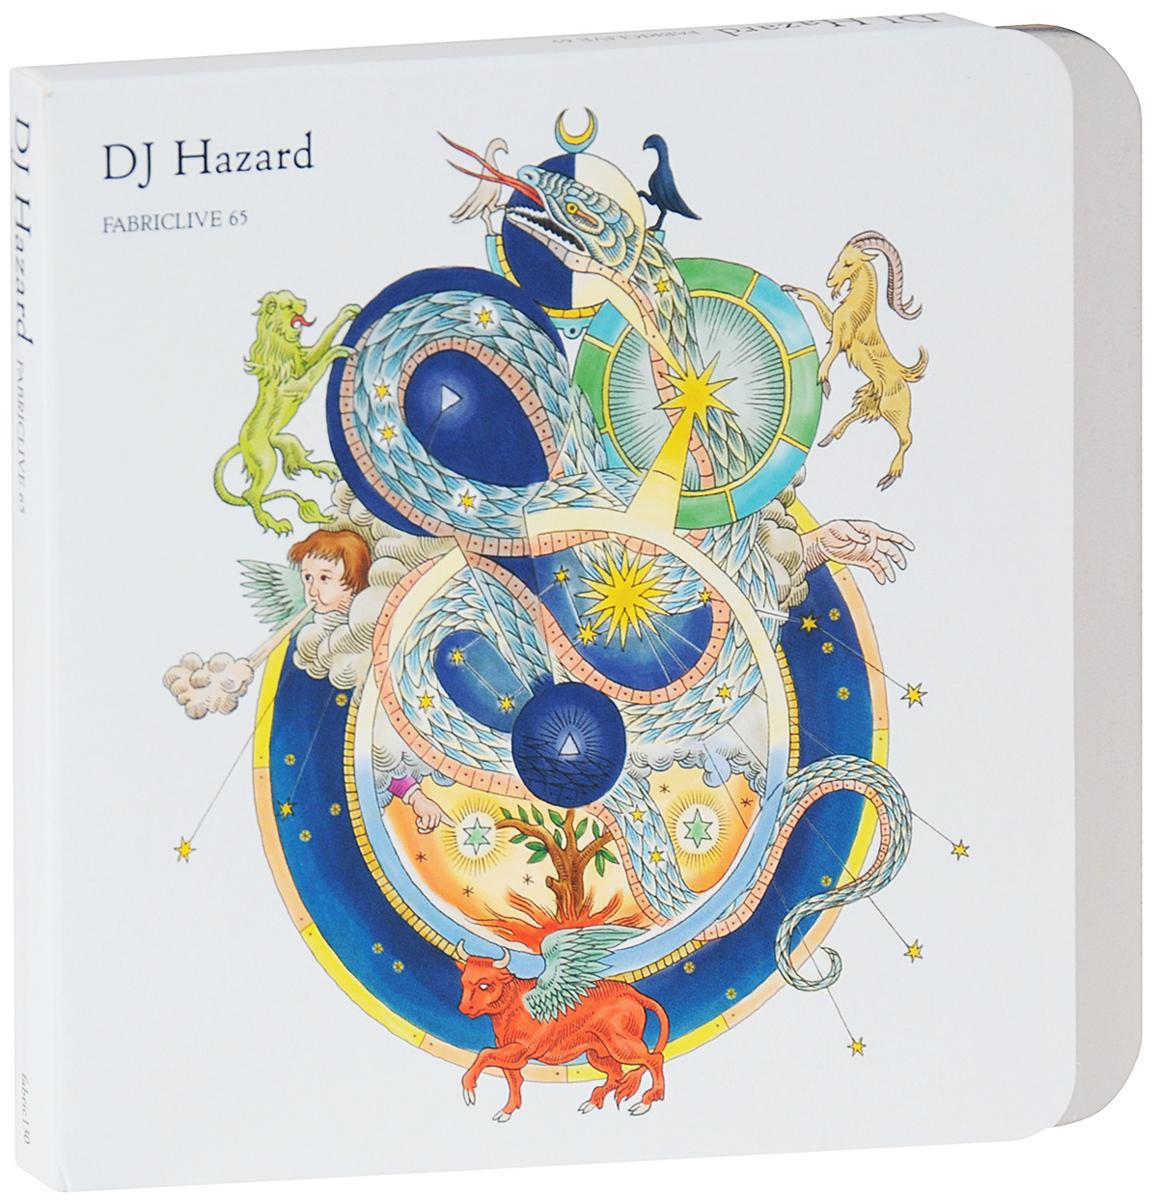 Dj Hazard. Fabriclive 65 2012 Audio CD